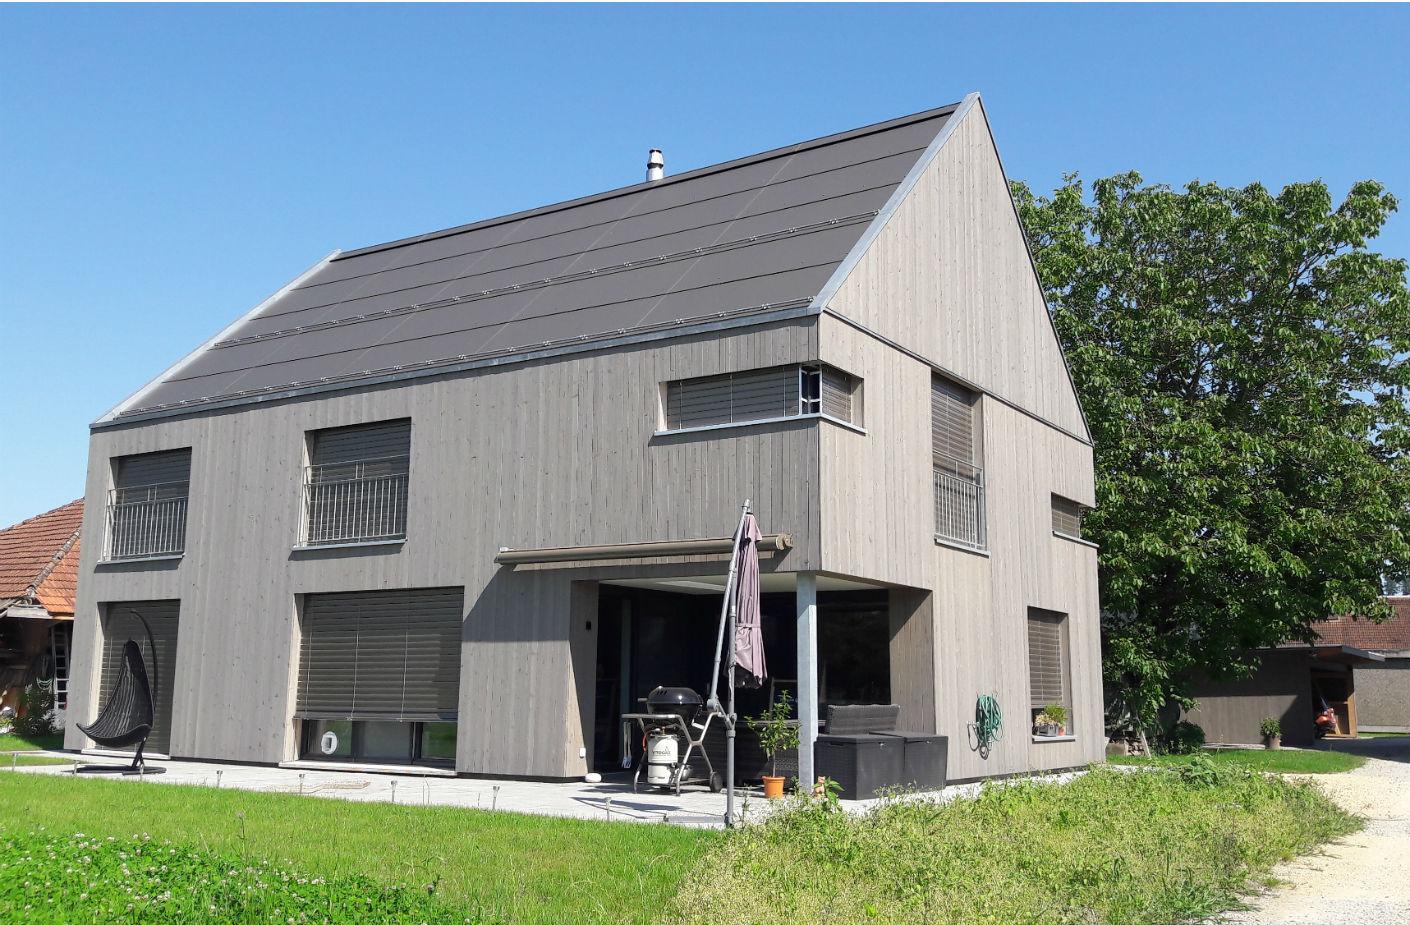 Neubau einfamilienhaus m ller aarberg for Neubau einfamilienhaus